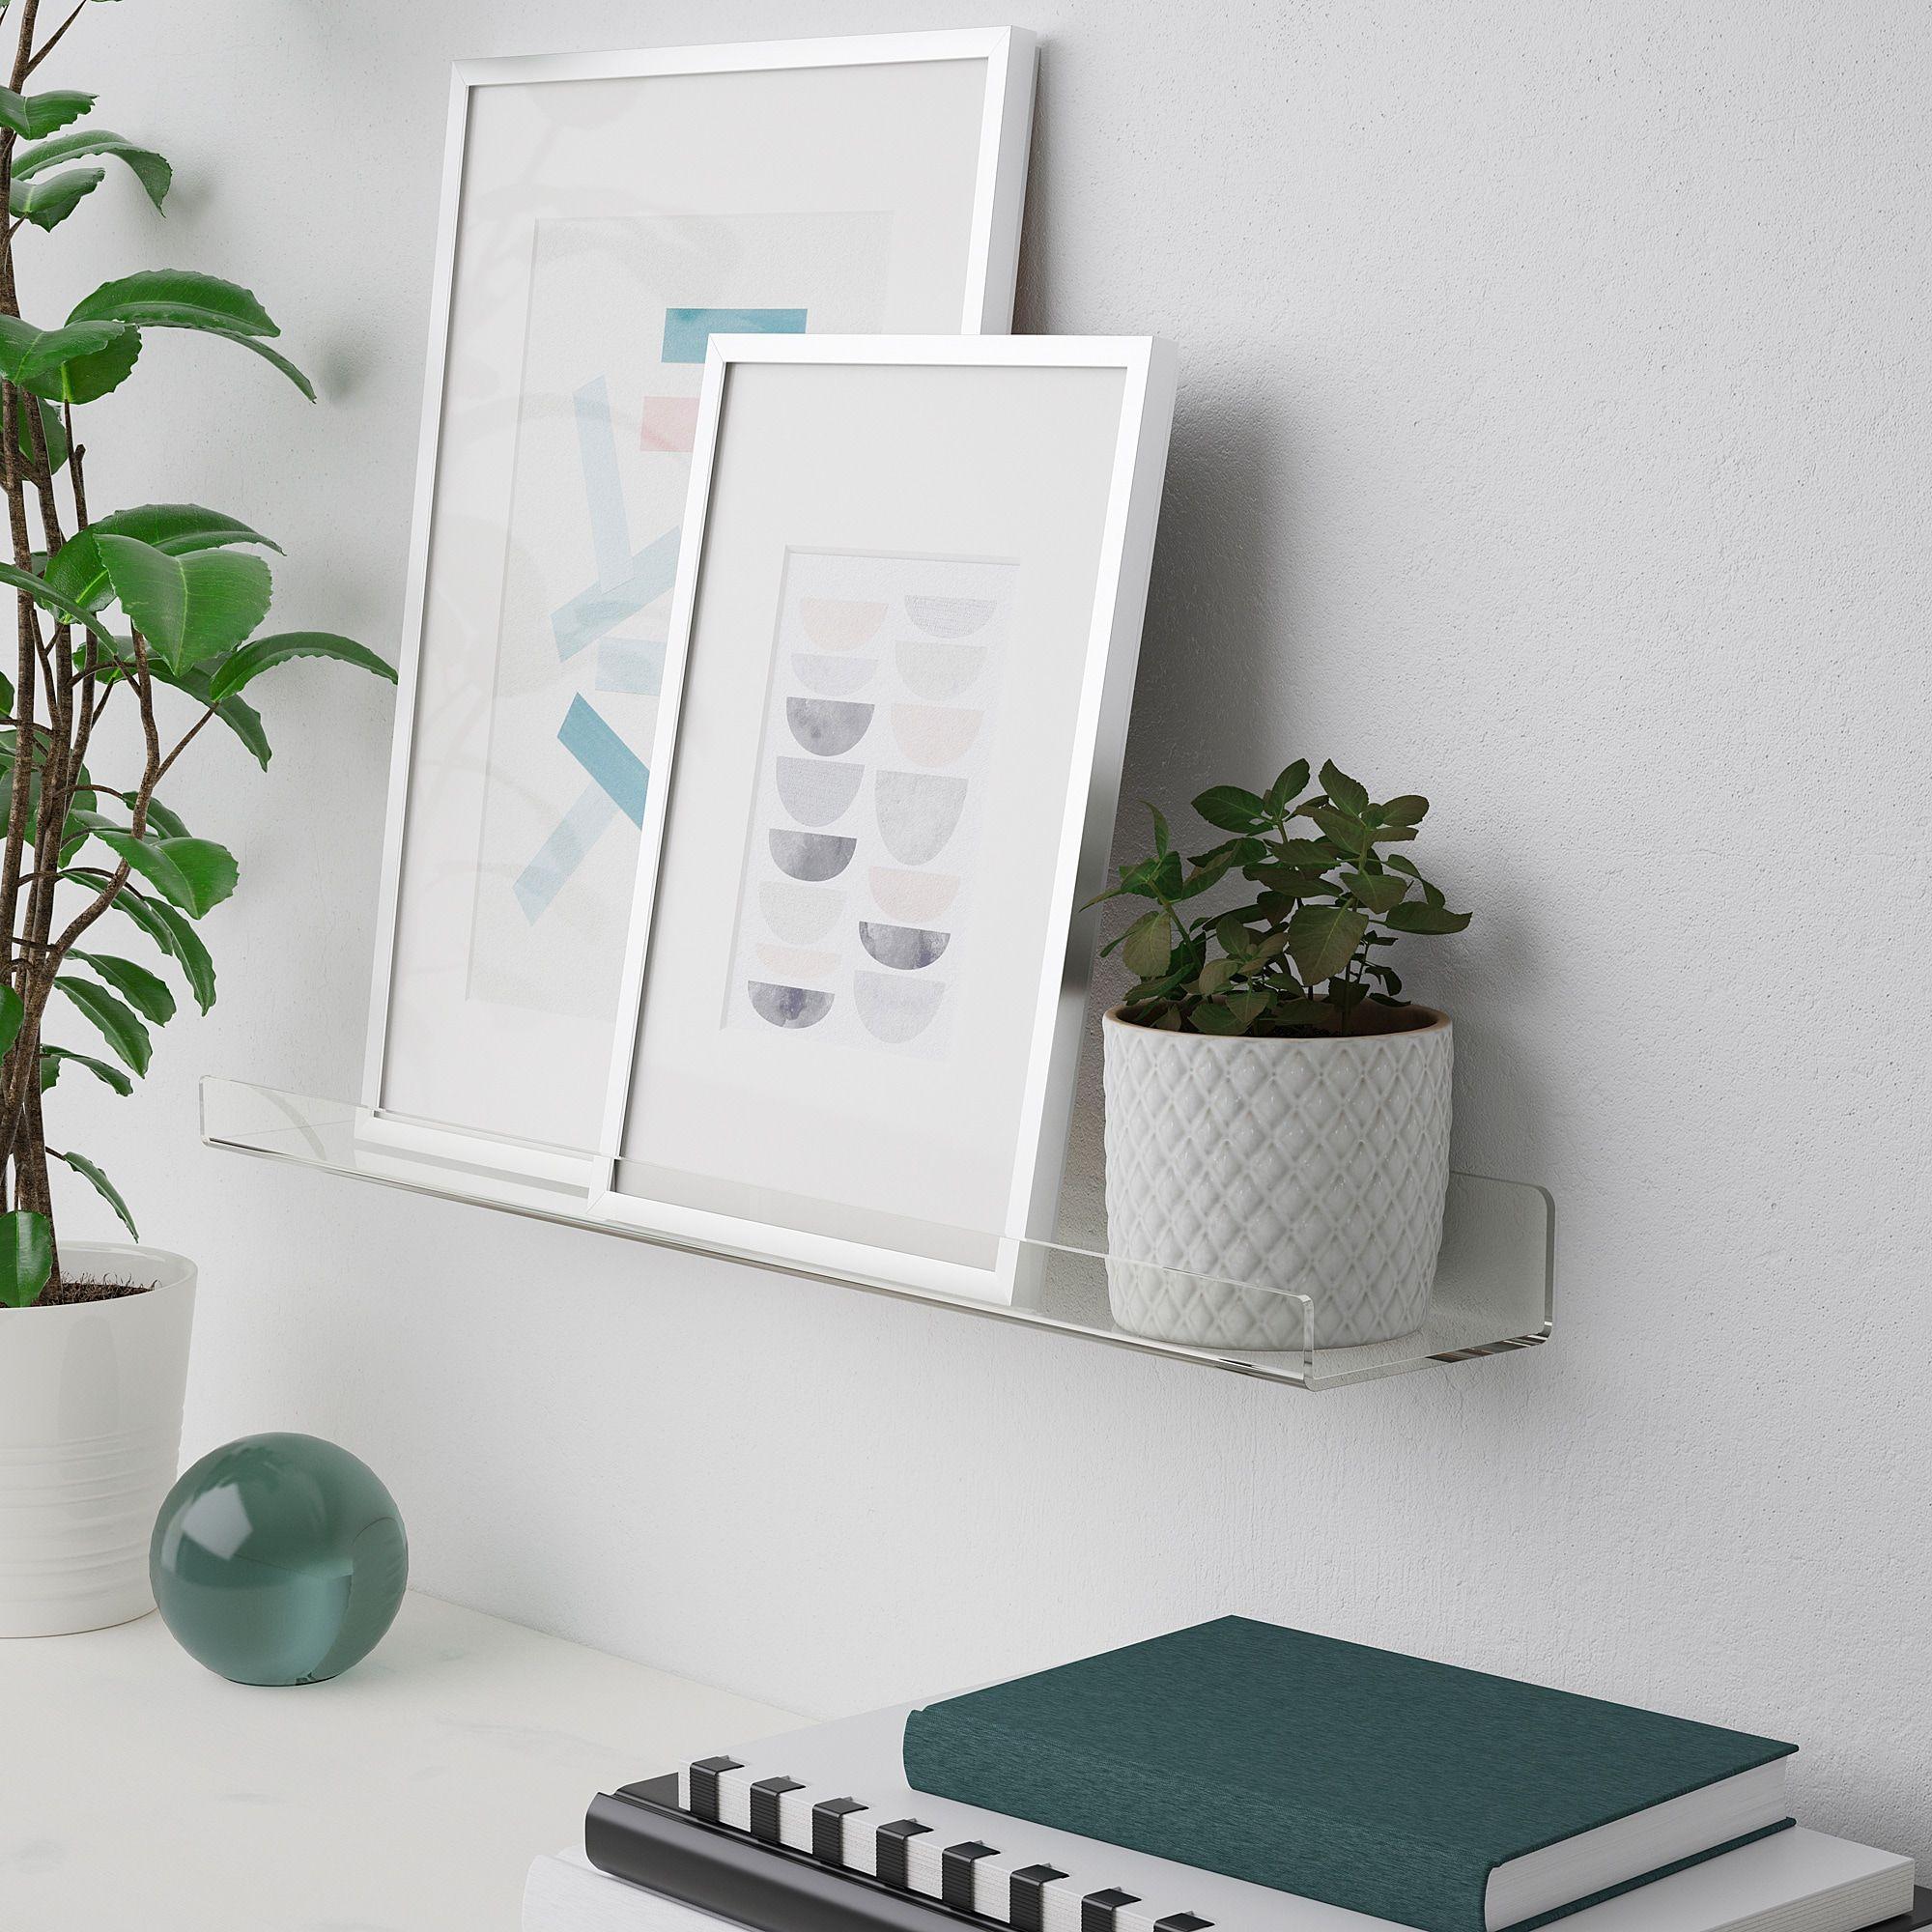 Mellosa Bilderleiste Transparent Bild Leiste Bilderleiste Und Ikea